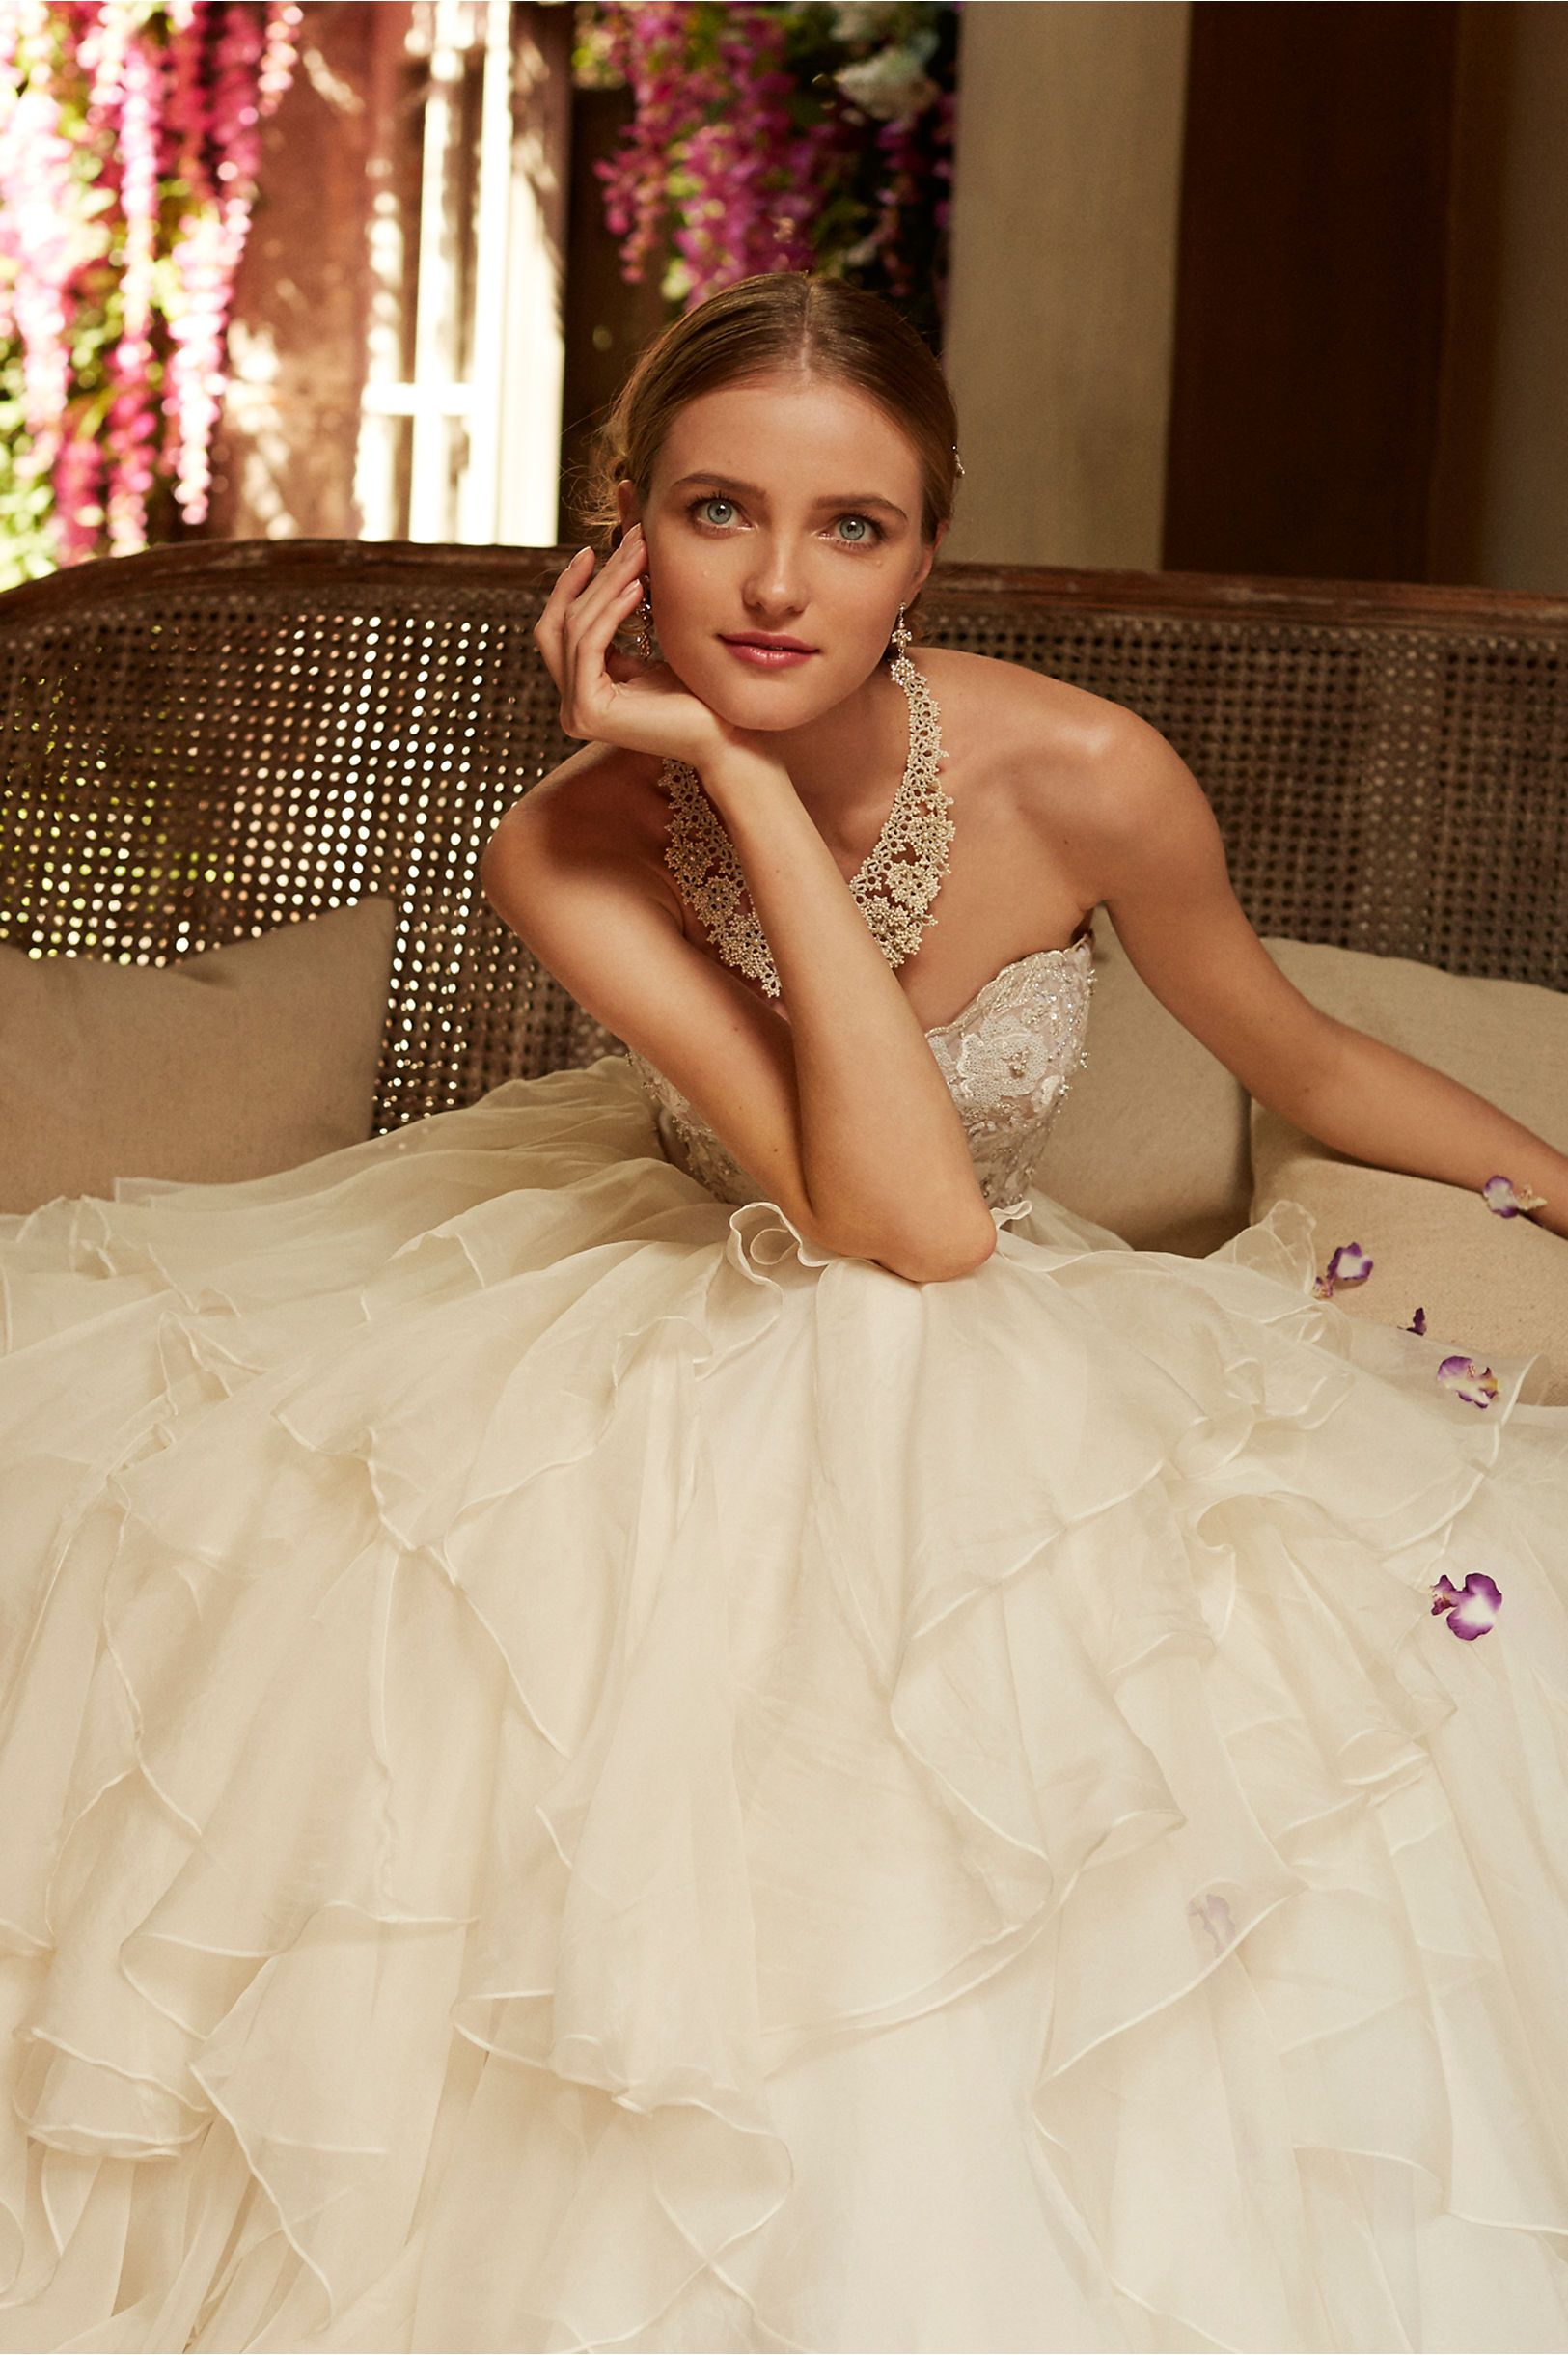 Wedding dress runaway bride  Maelin Corset and Priya Skirt from BHLDN Such a romantic gown  Say